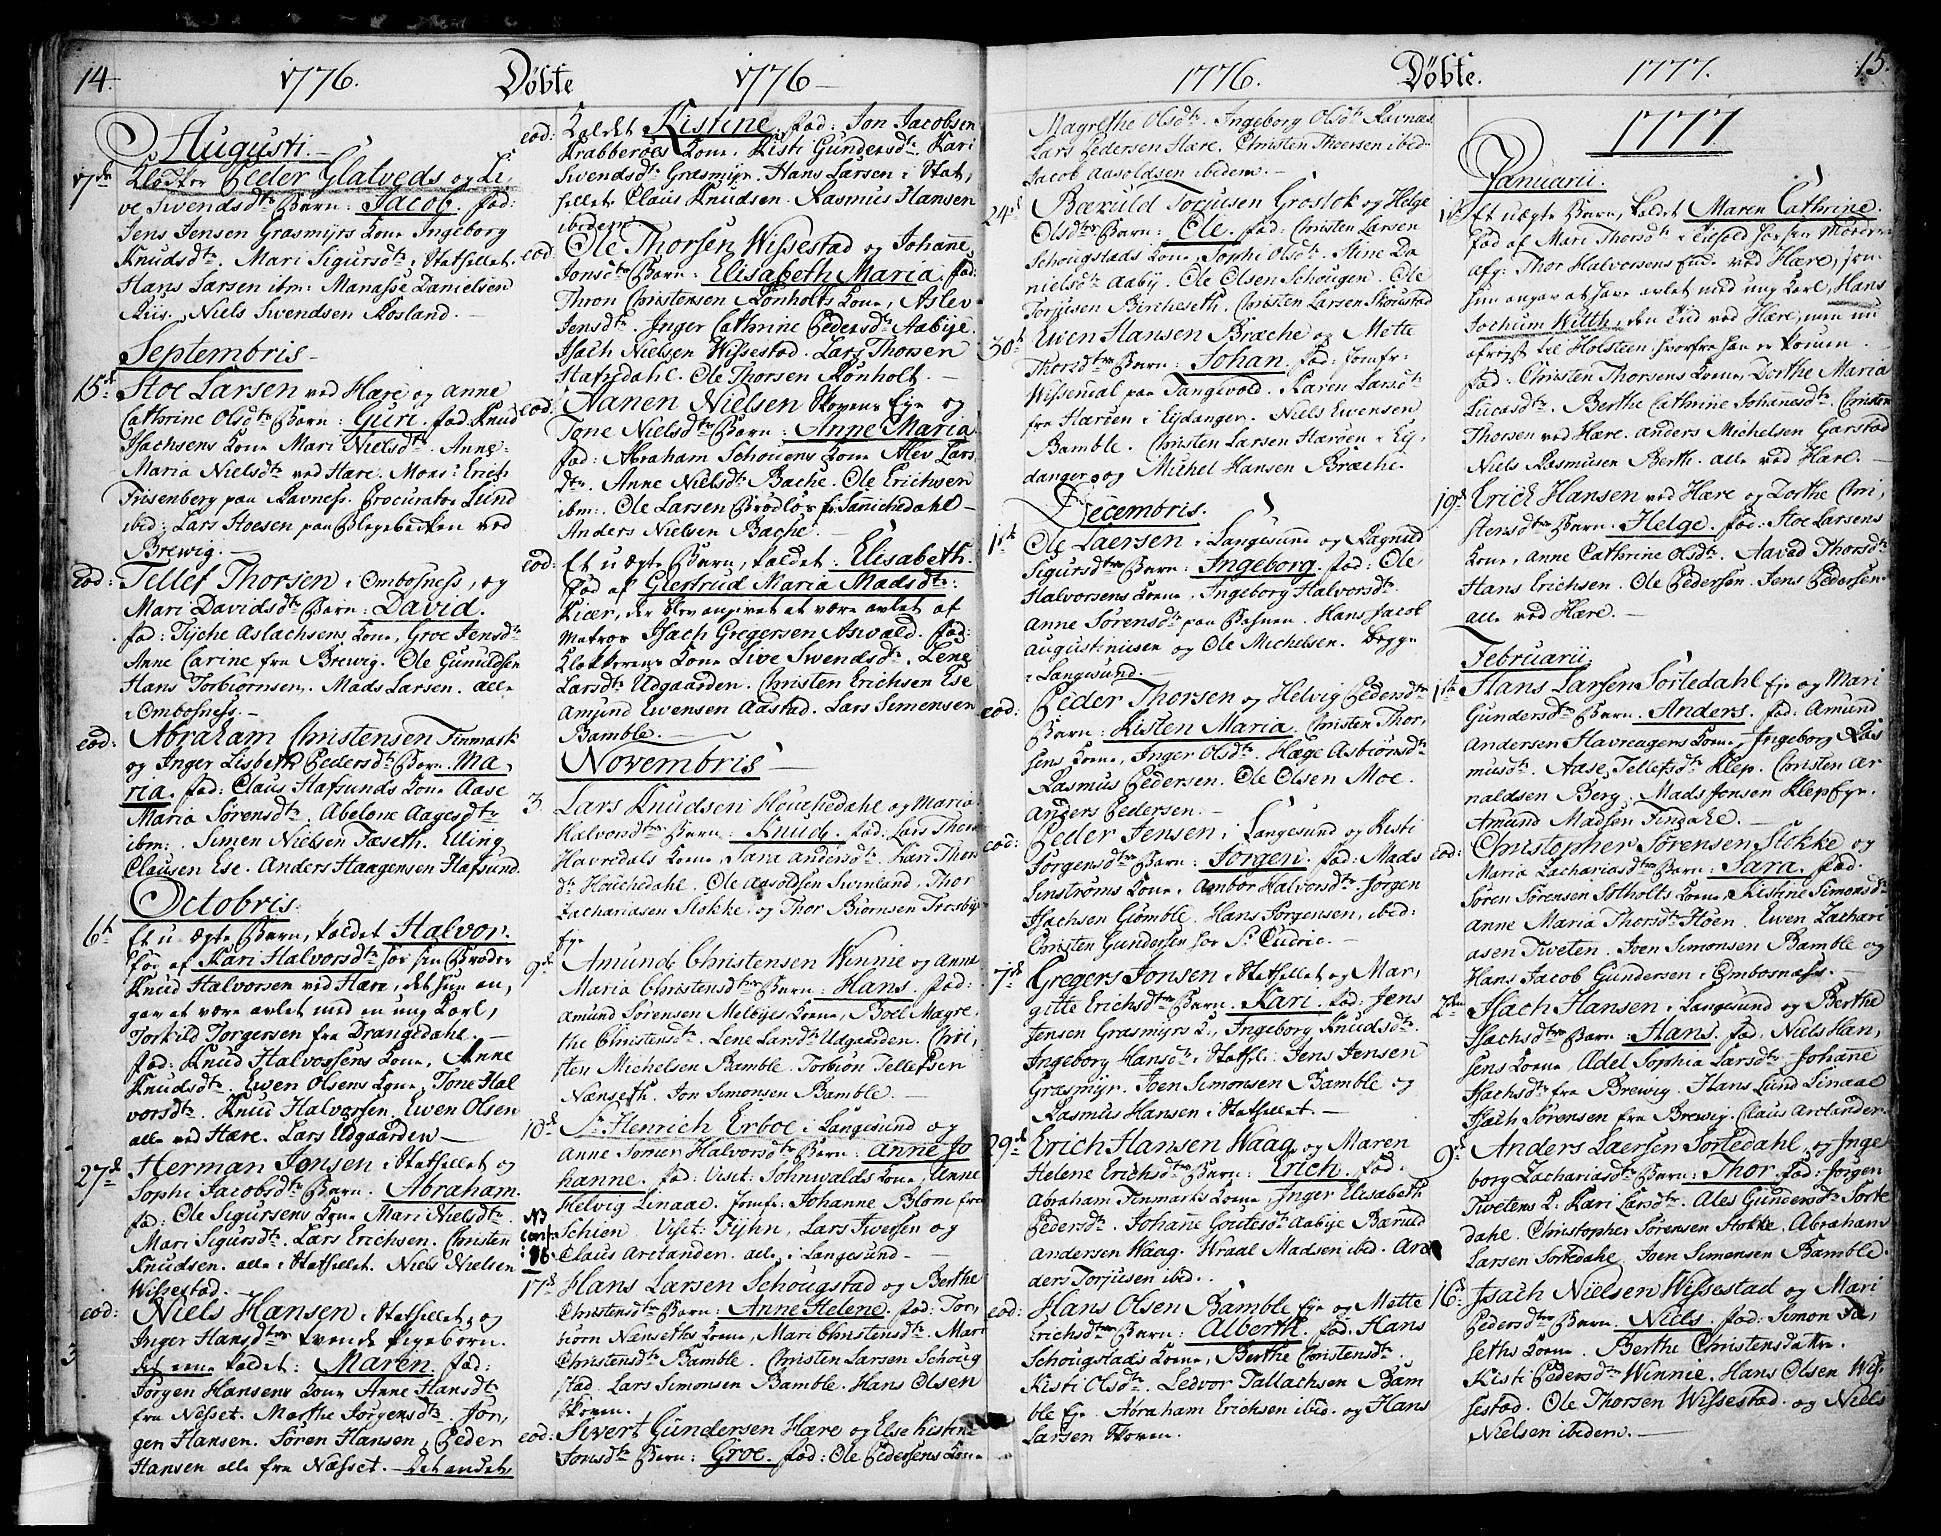 SAKO, Bamble kirkebøker, F/Fa/L0002: Ministerialbok nr. I 2, 1775-1814, s. 14-15